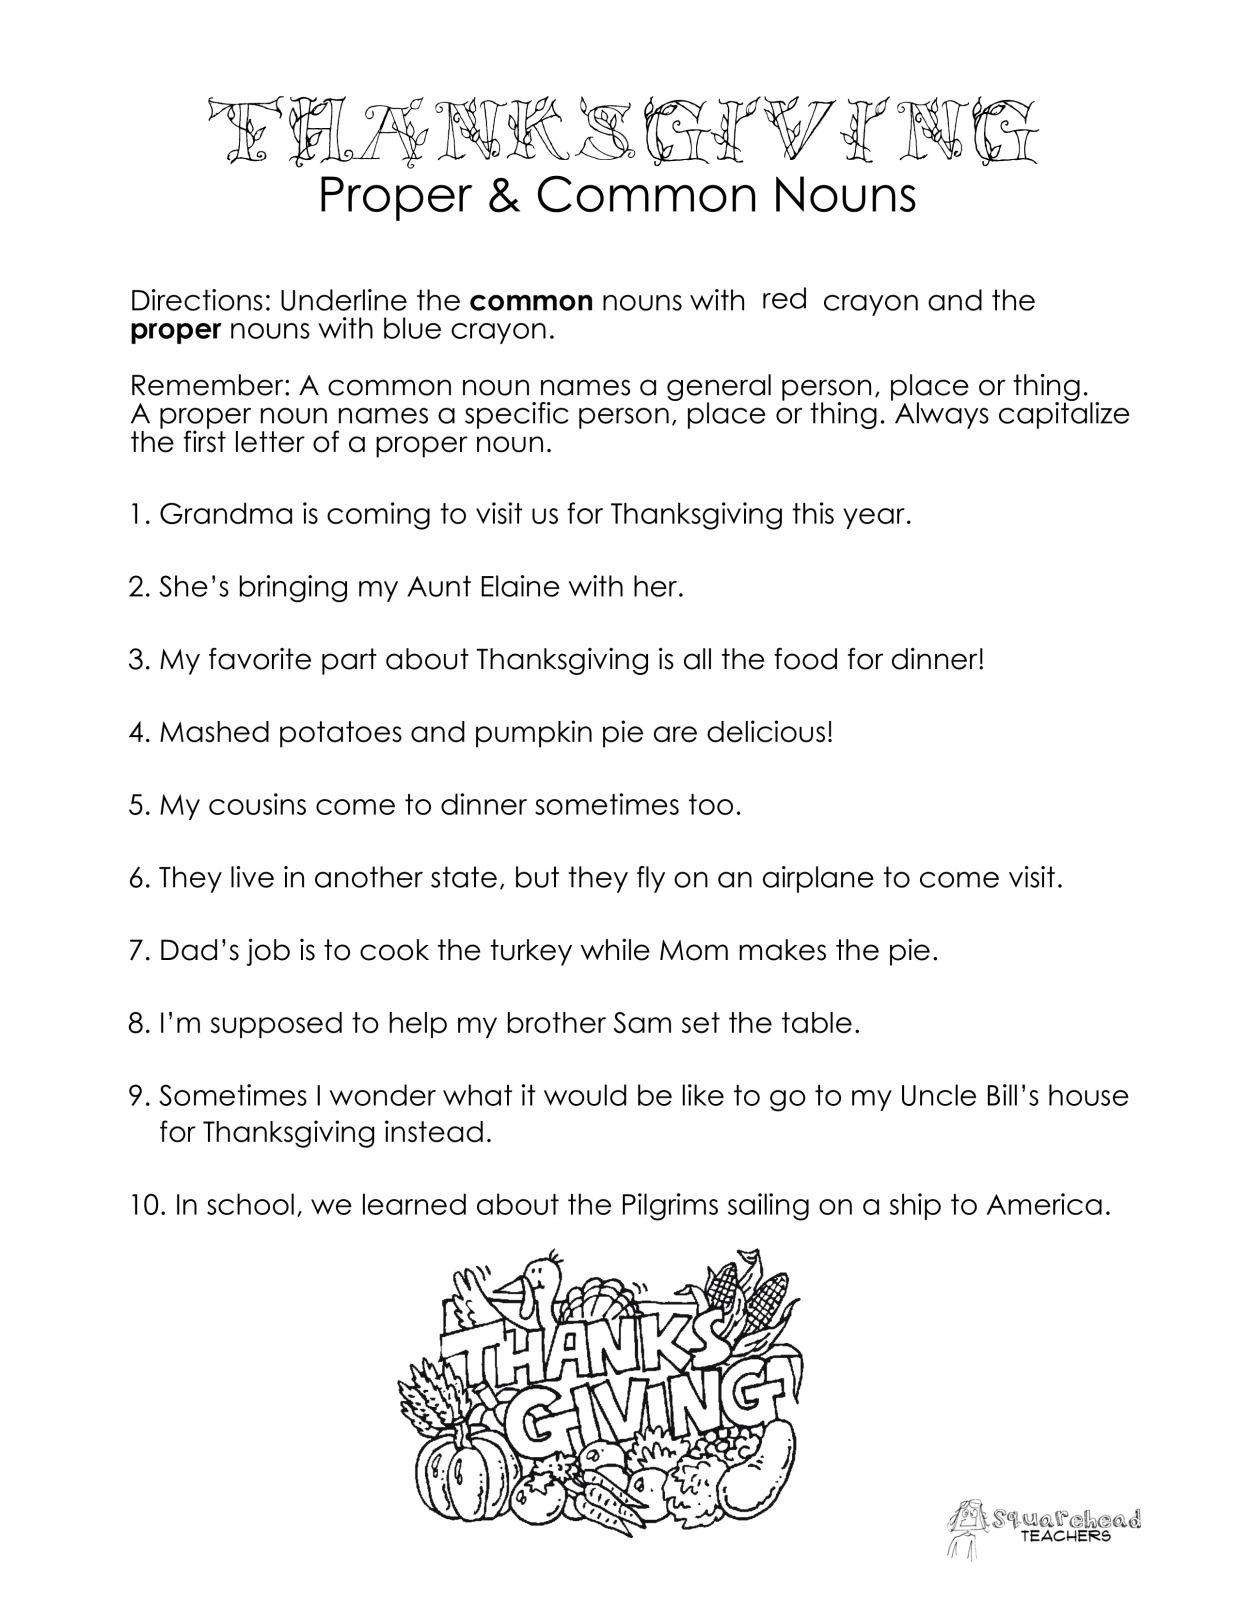 Thanksgiving Common vs. Proper Nouns worksheet | Proper ...